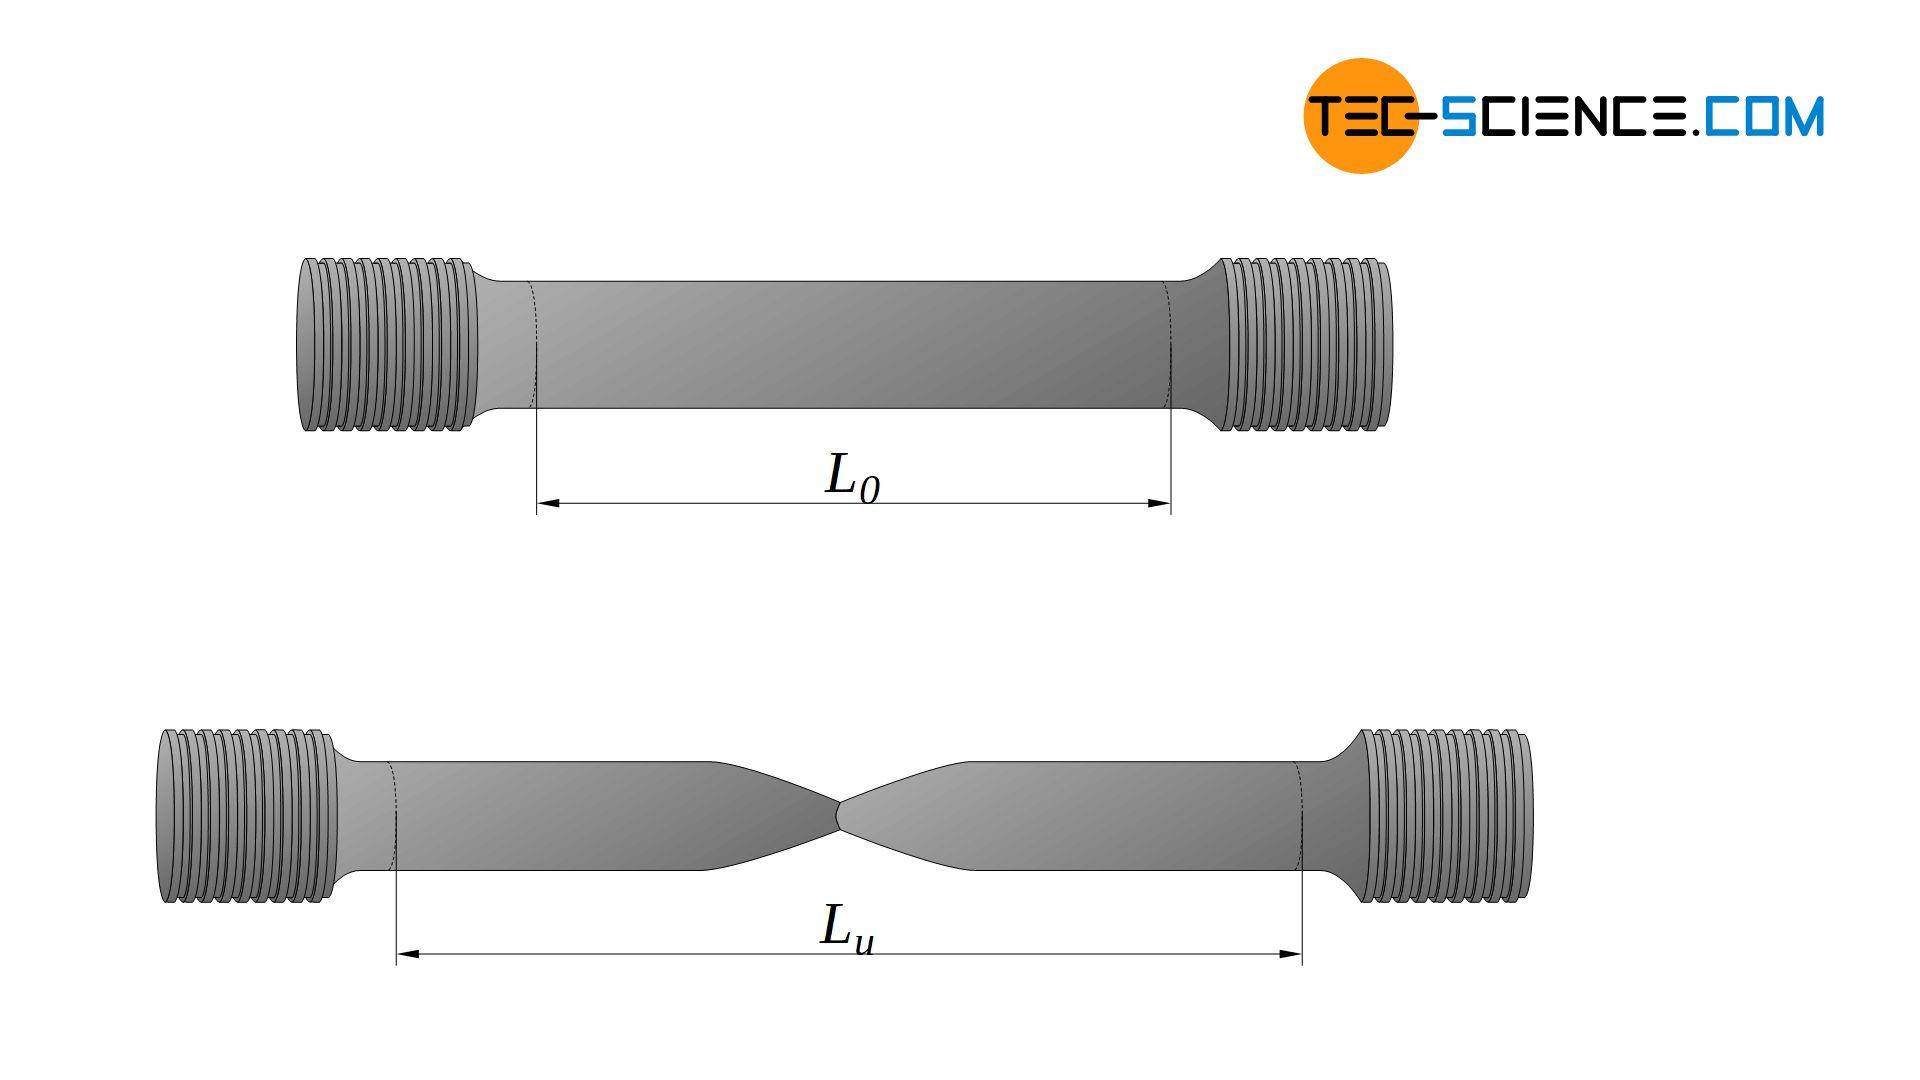 Determination of the fracture strain (elongation at break)